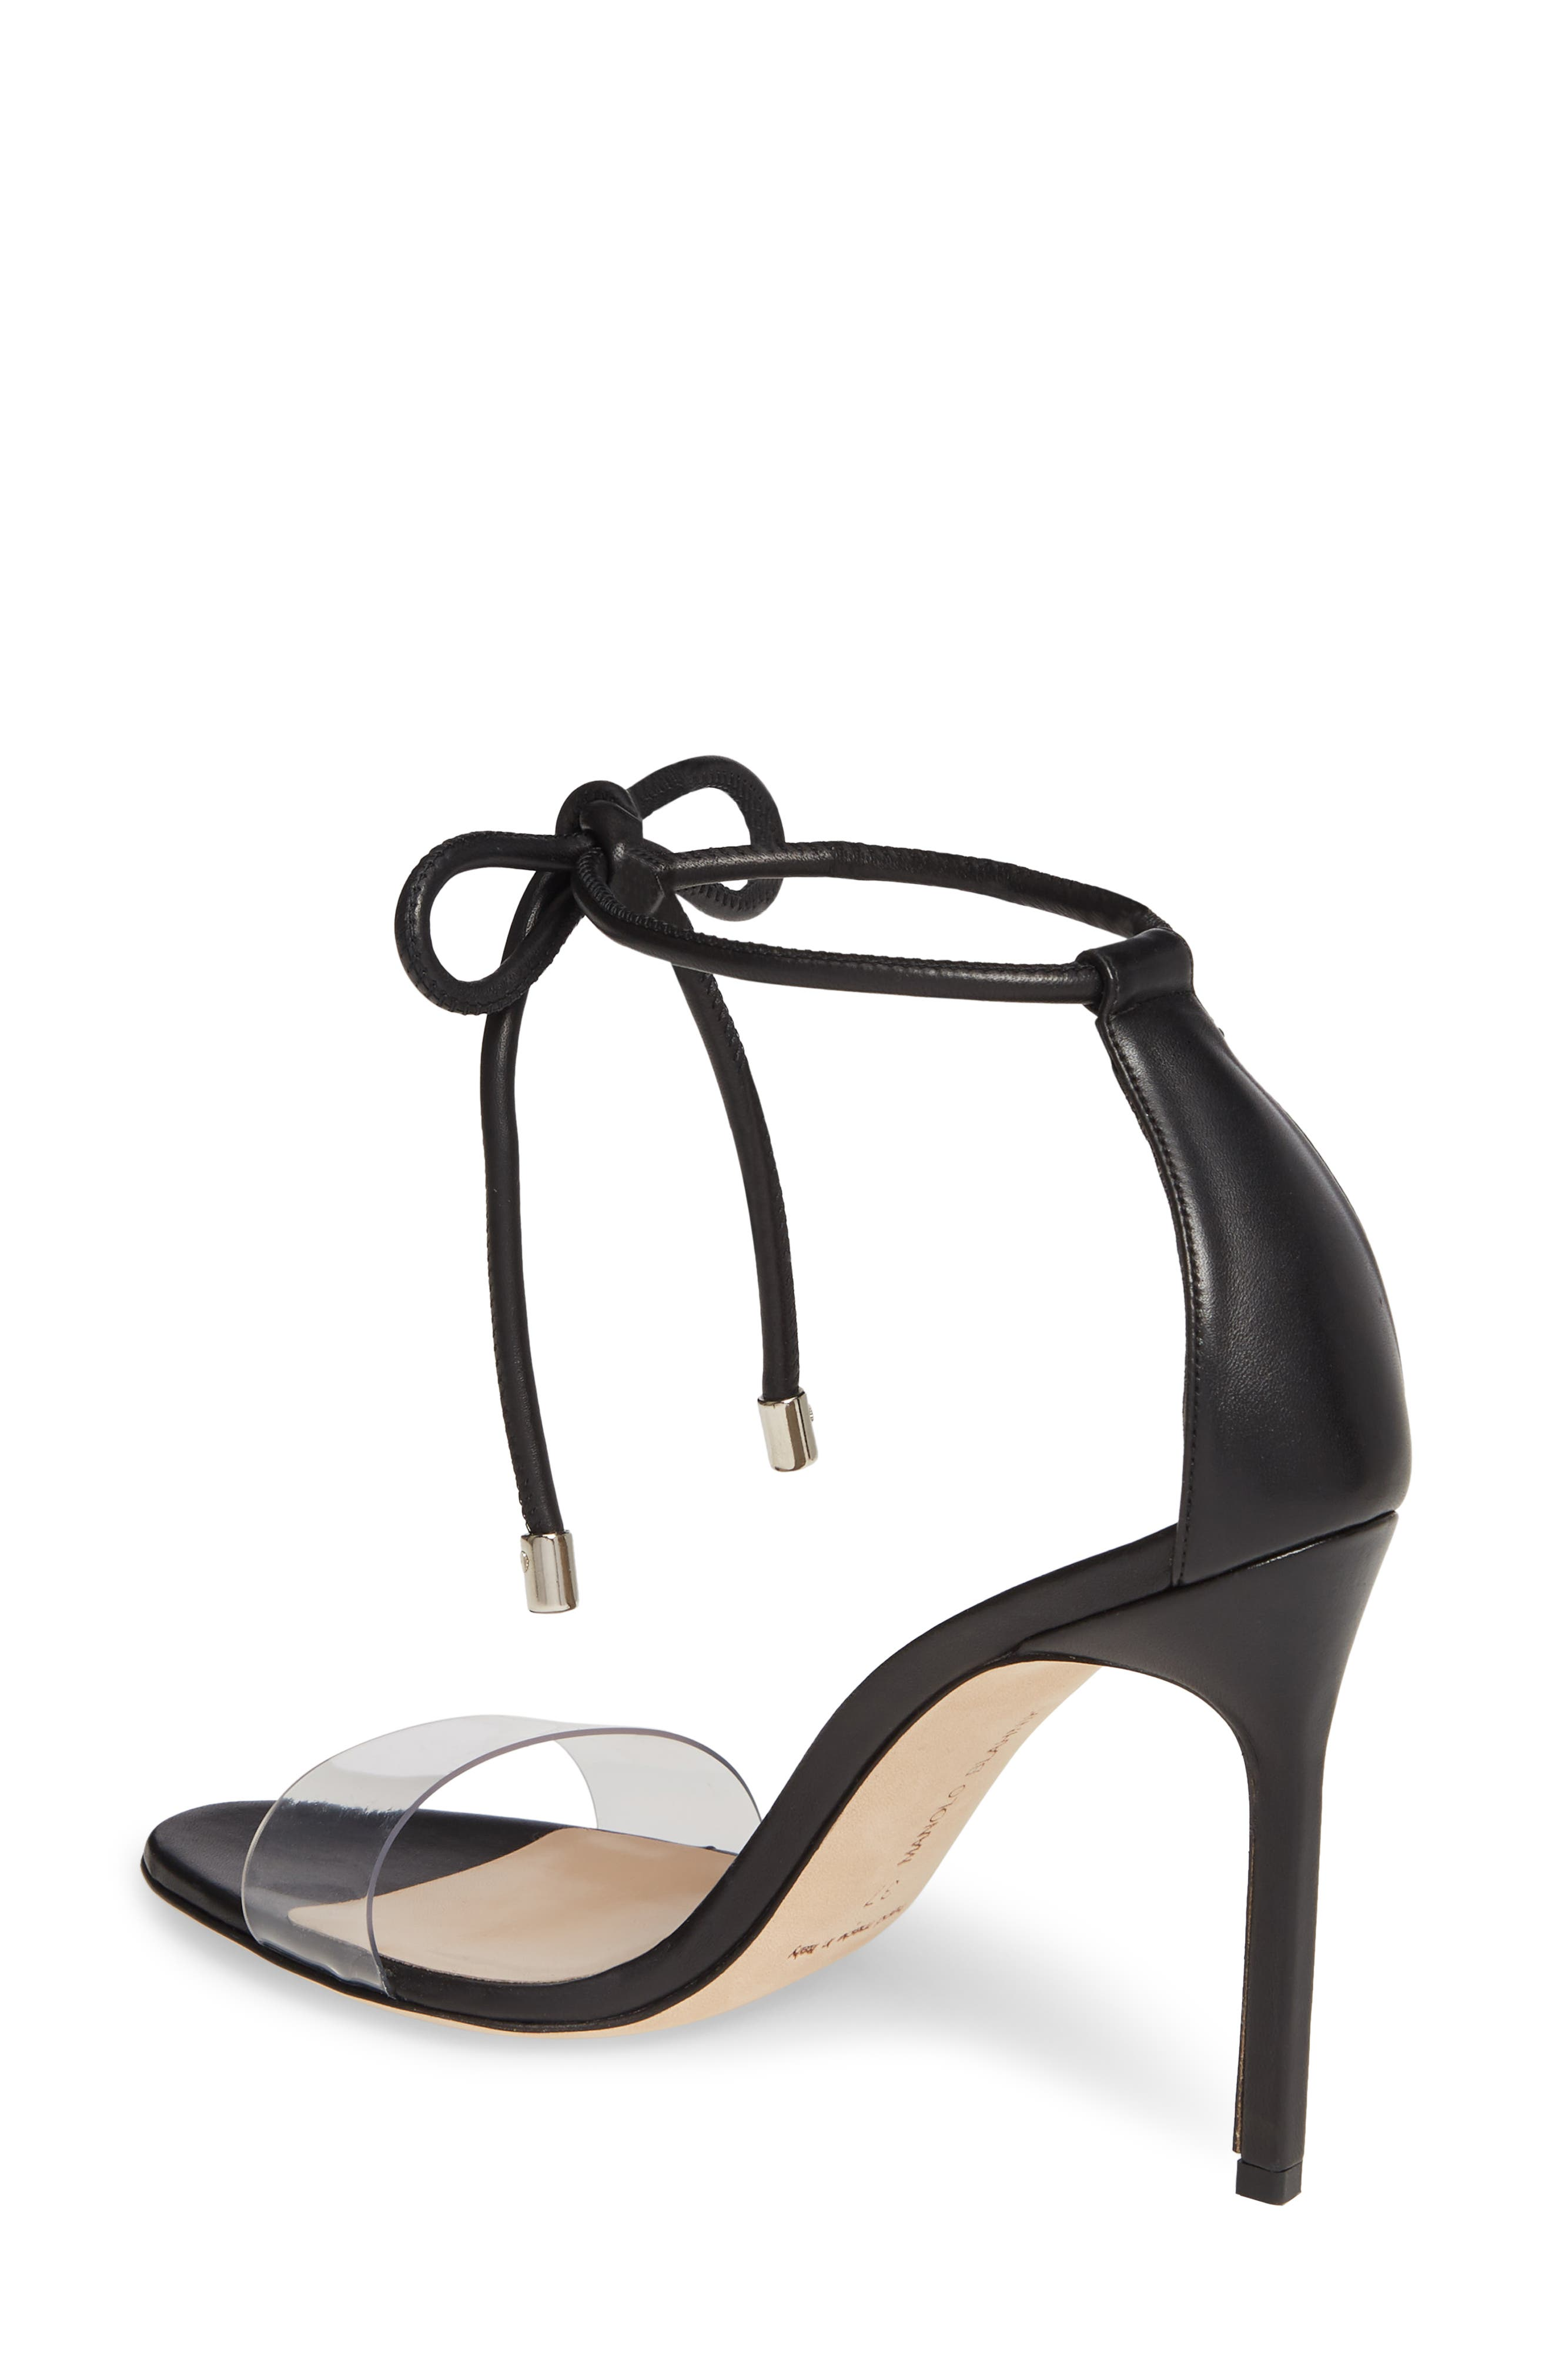 MANOLO BLAHNIK, Estro Ankle Tie Sandal, Alternate thumbnail 2, color, BLACK LEATHER